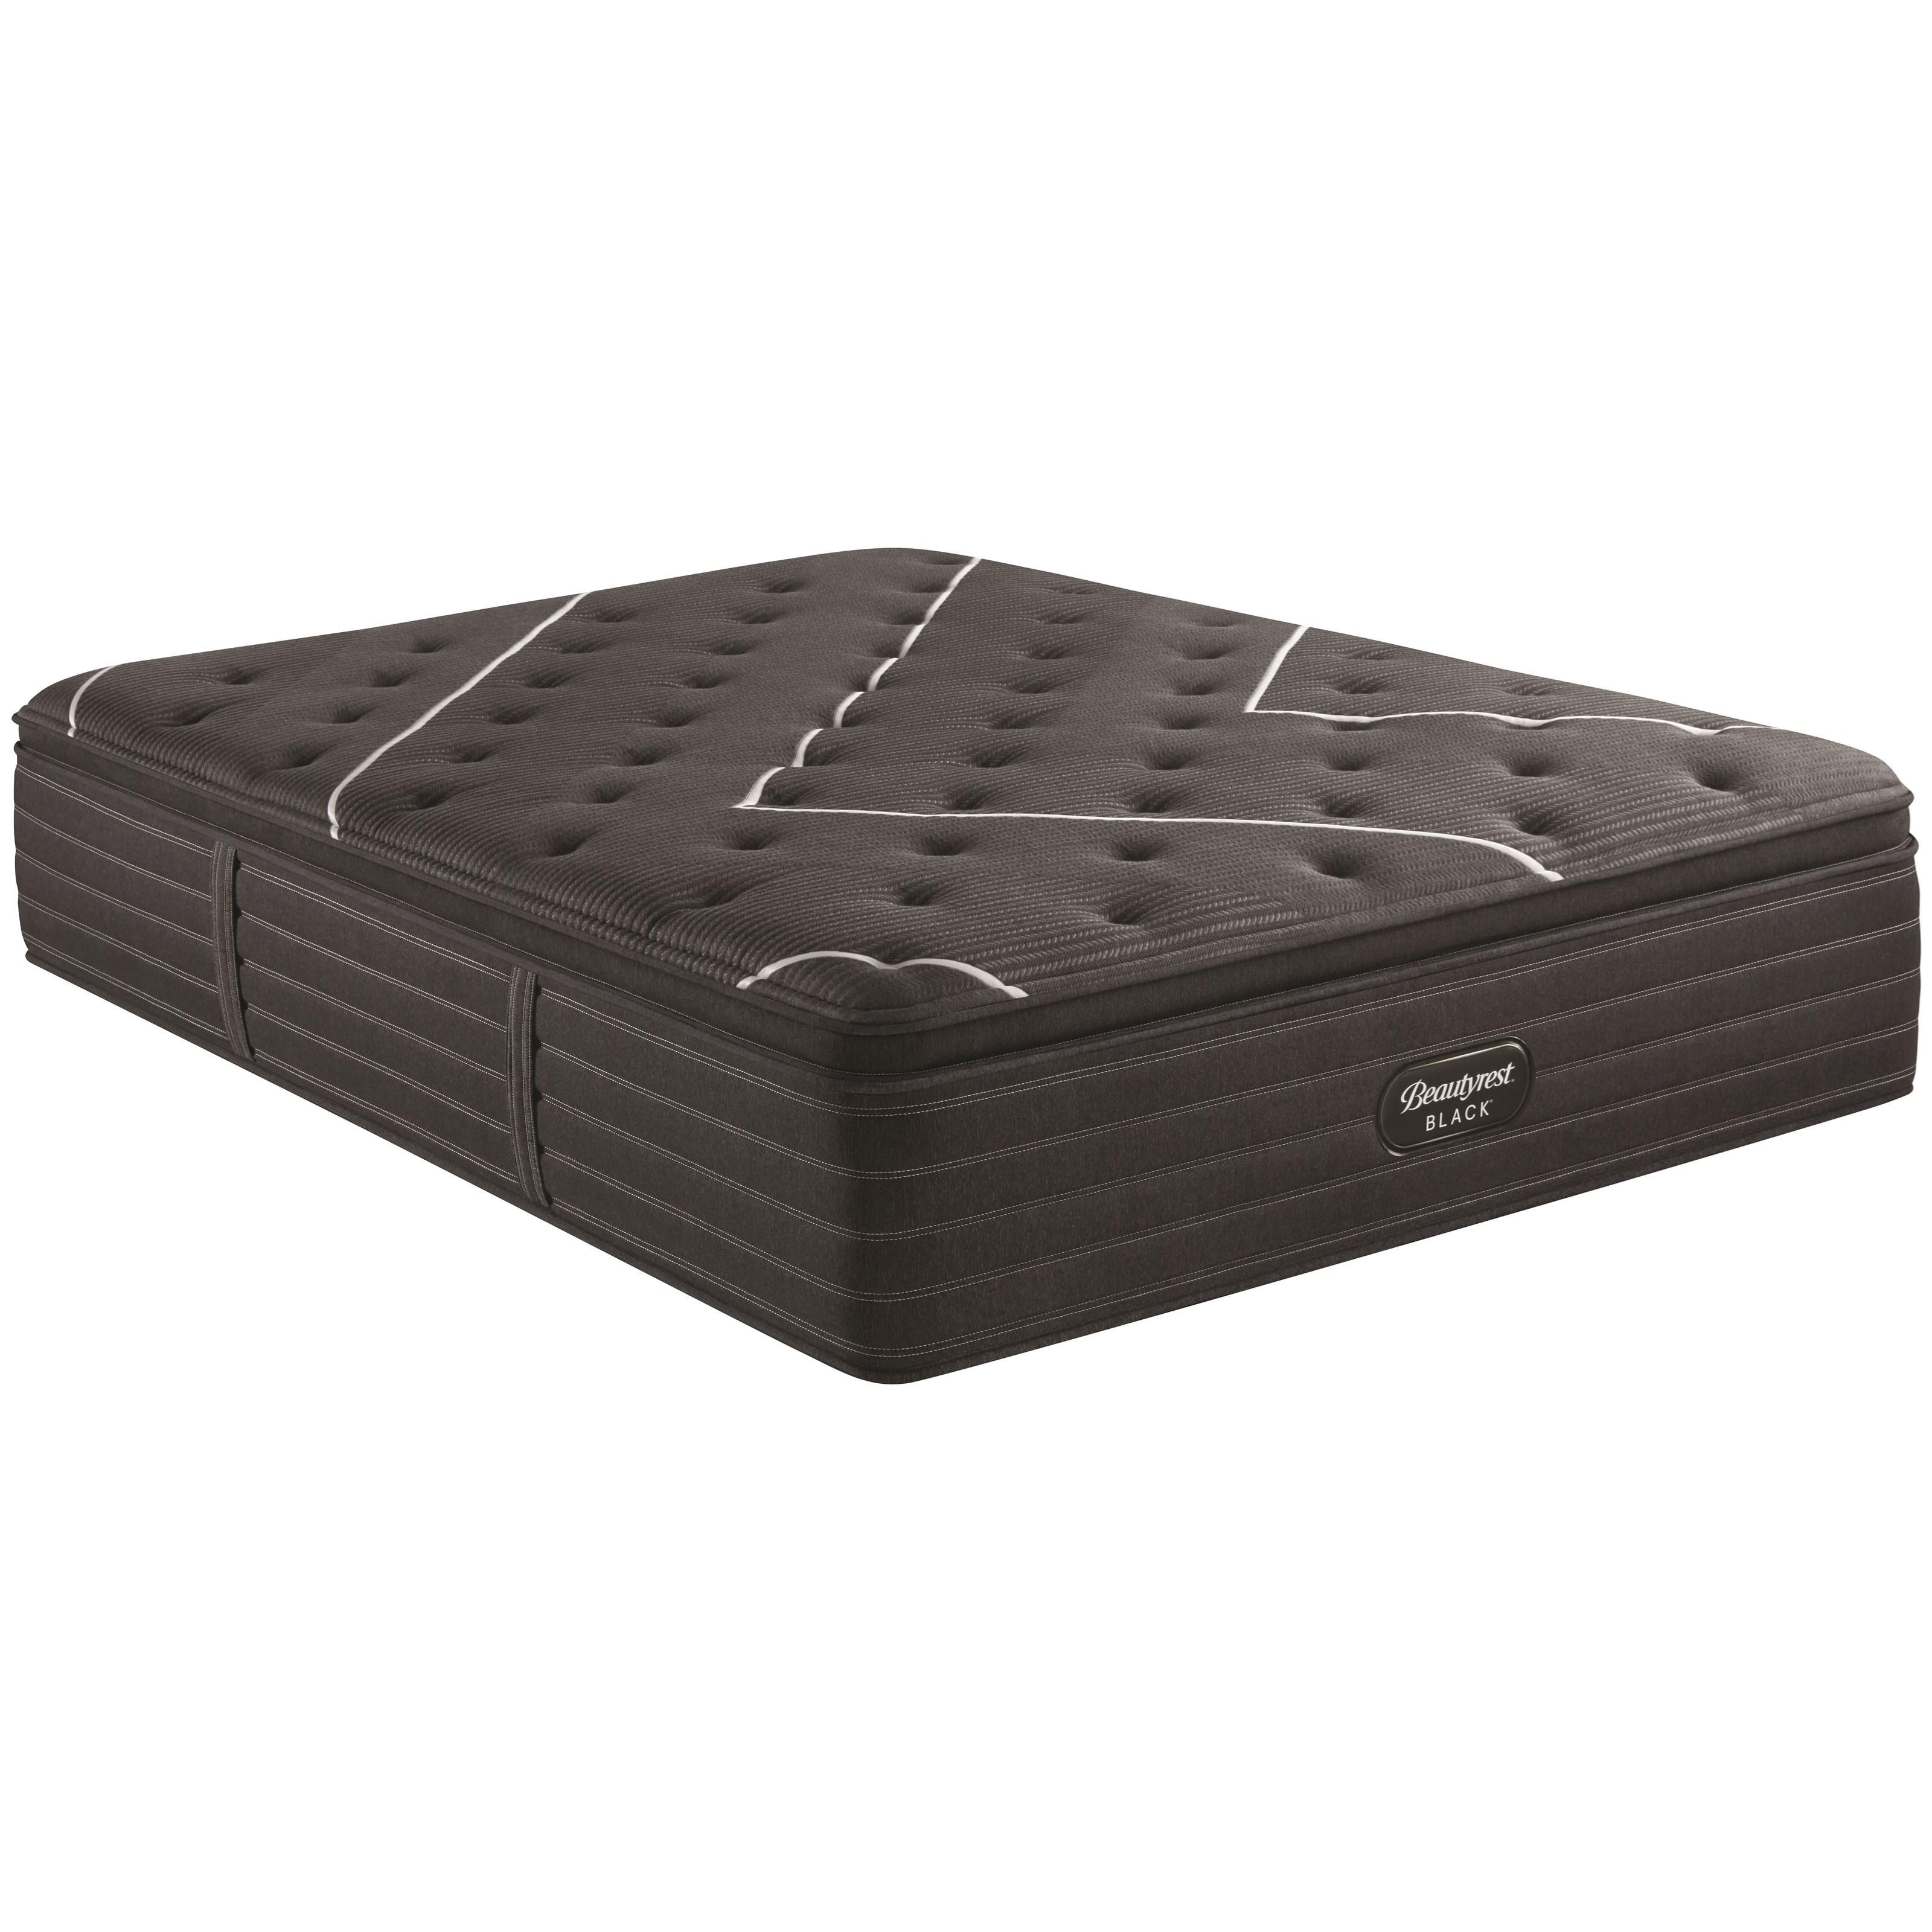 "King 16"" Medium Pillow Top Premium Mattress"